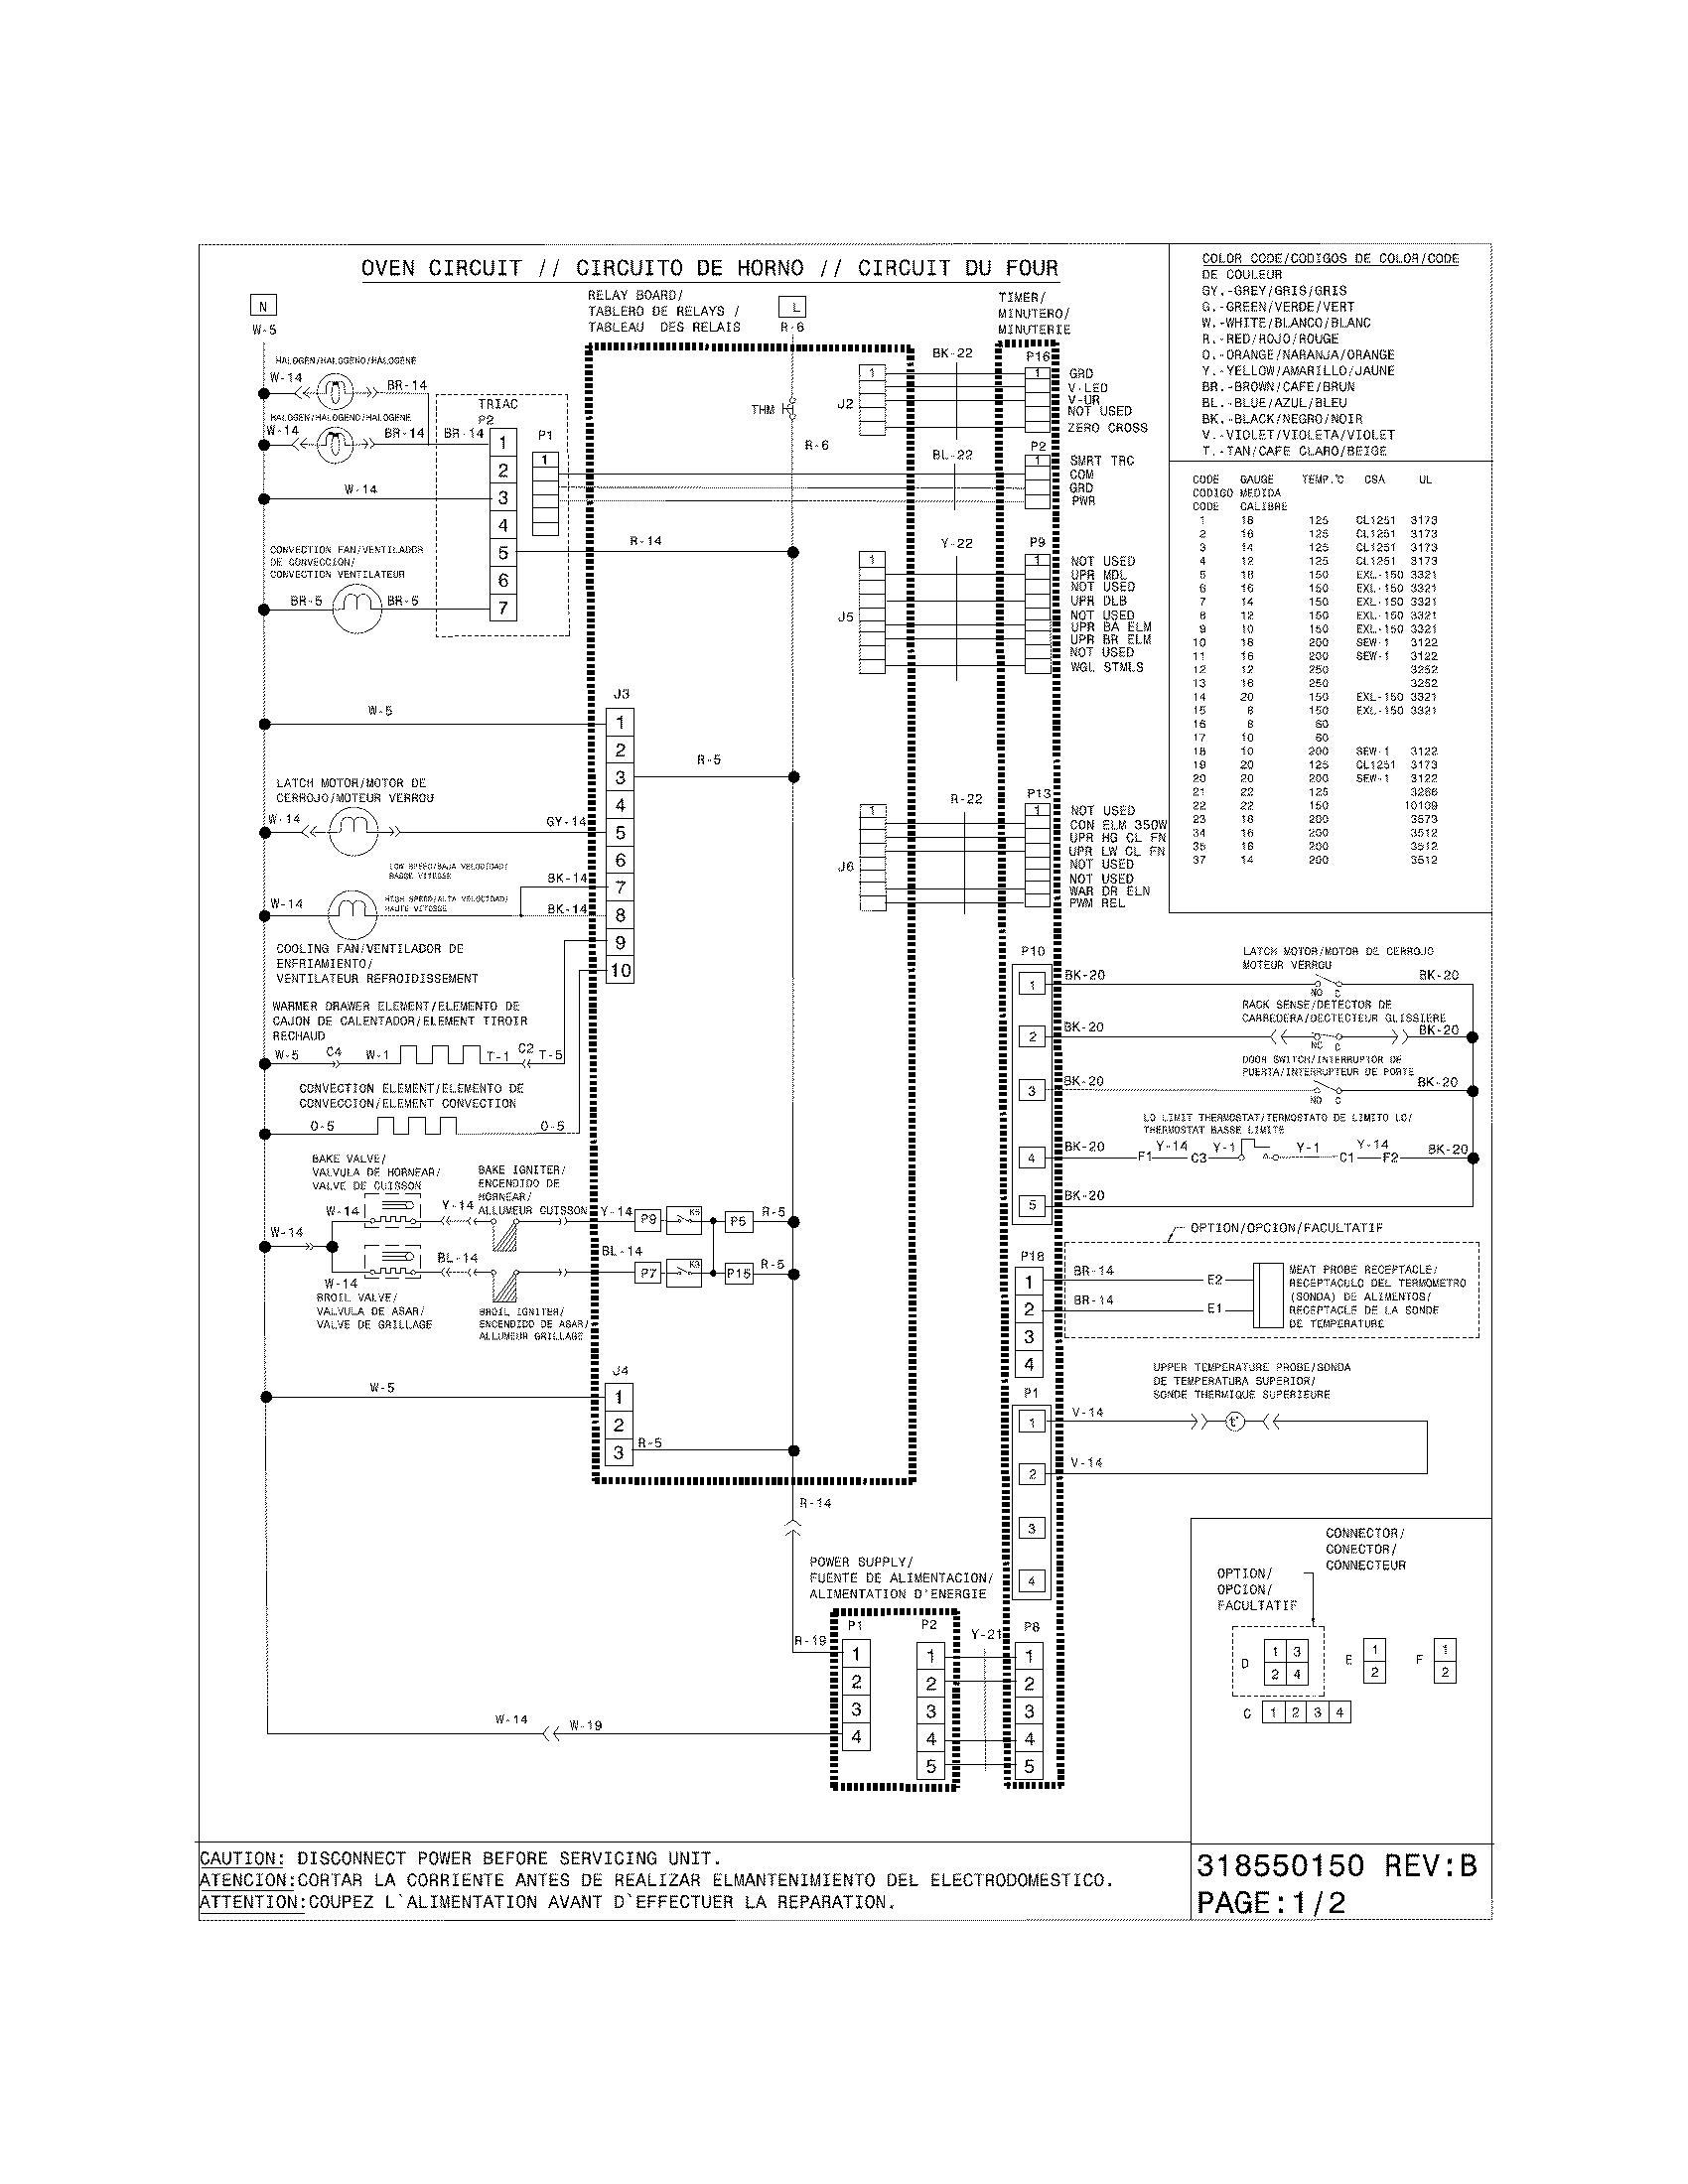 electrolux wiring diagram friedland door chimes model ew30gs75ksd slide in range gas genuine parts